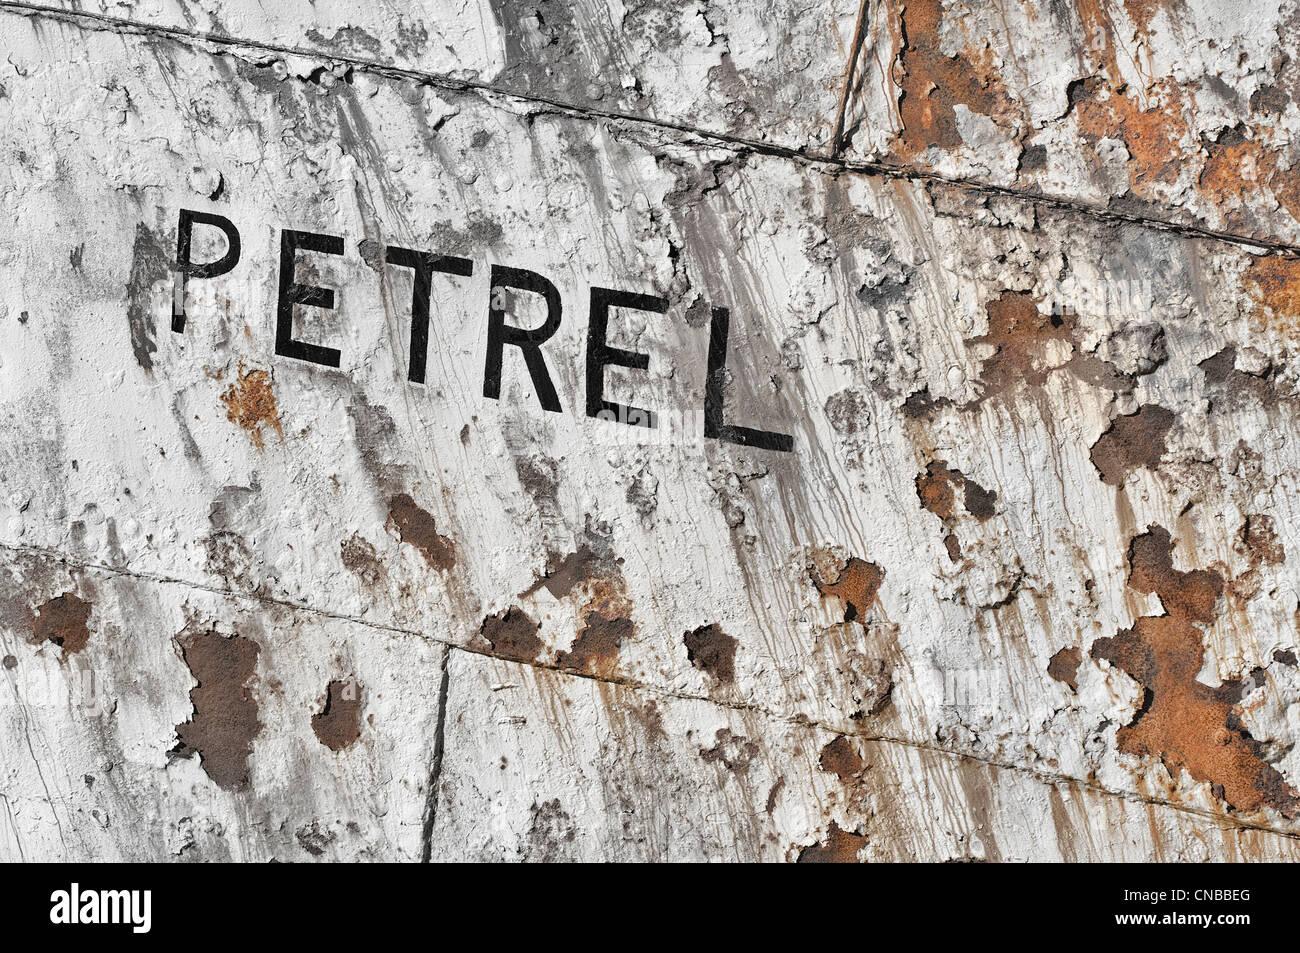 Abandoned Whaling ship rusting, Detail, Former Grytviken Whaling Station, South Georgia - Stock Image